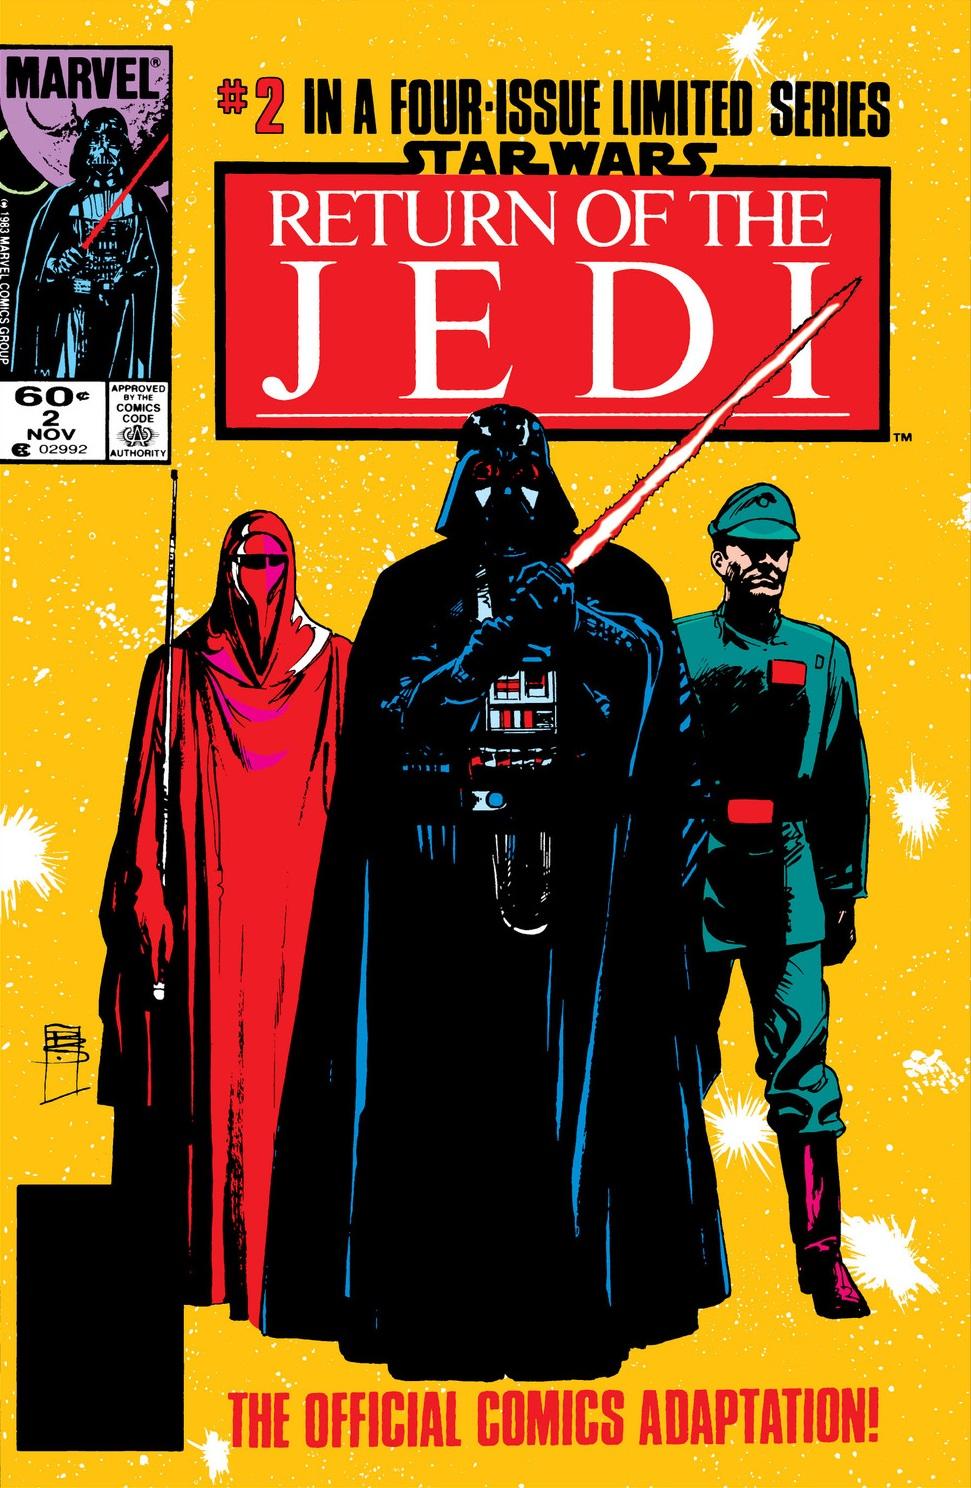 Star Wars Return of the Jedi 2 (Marvel)